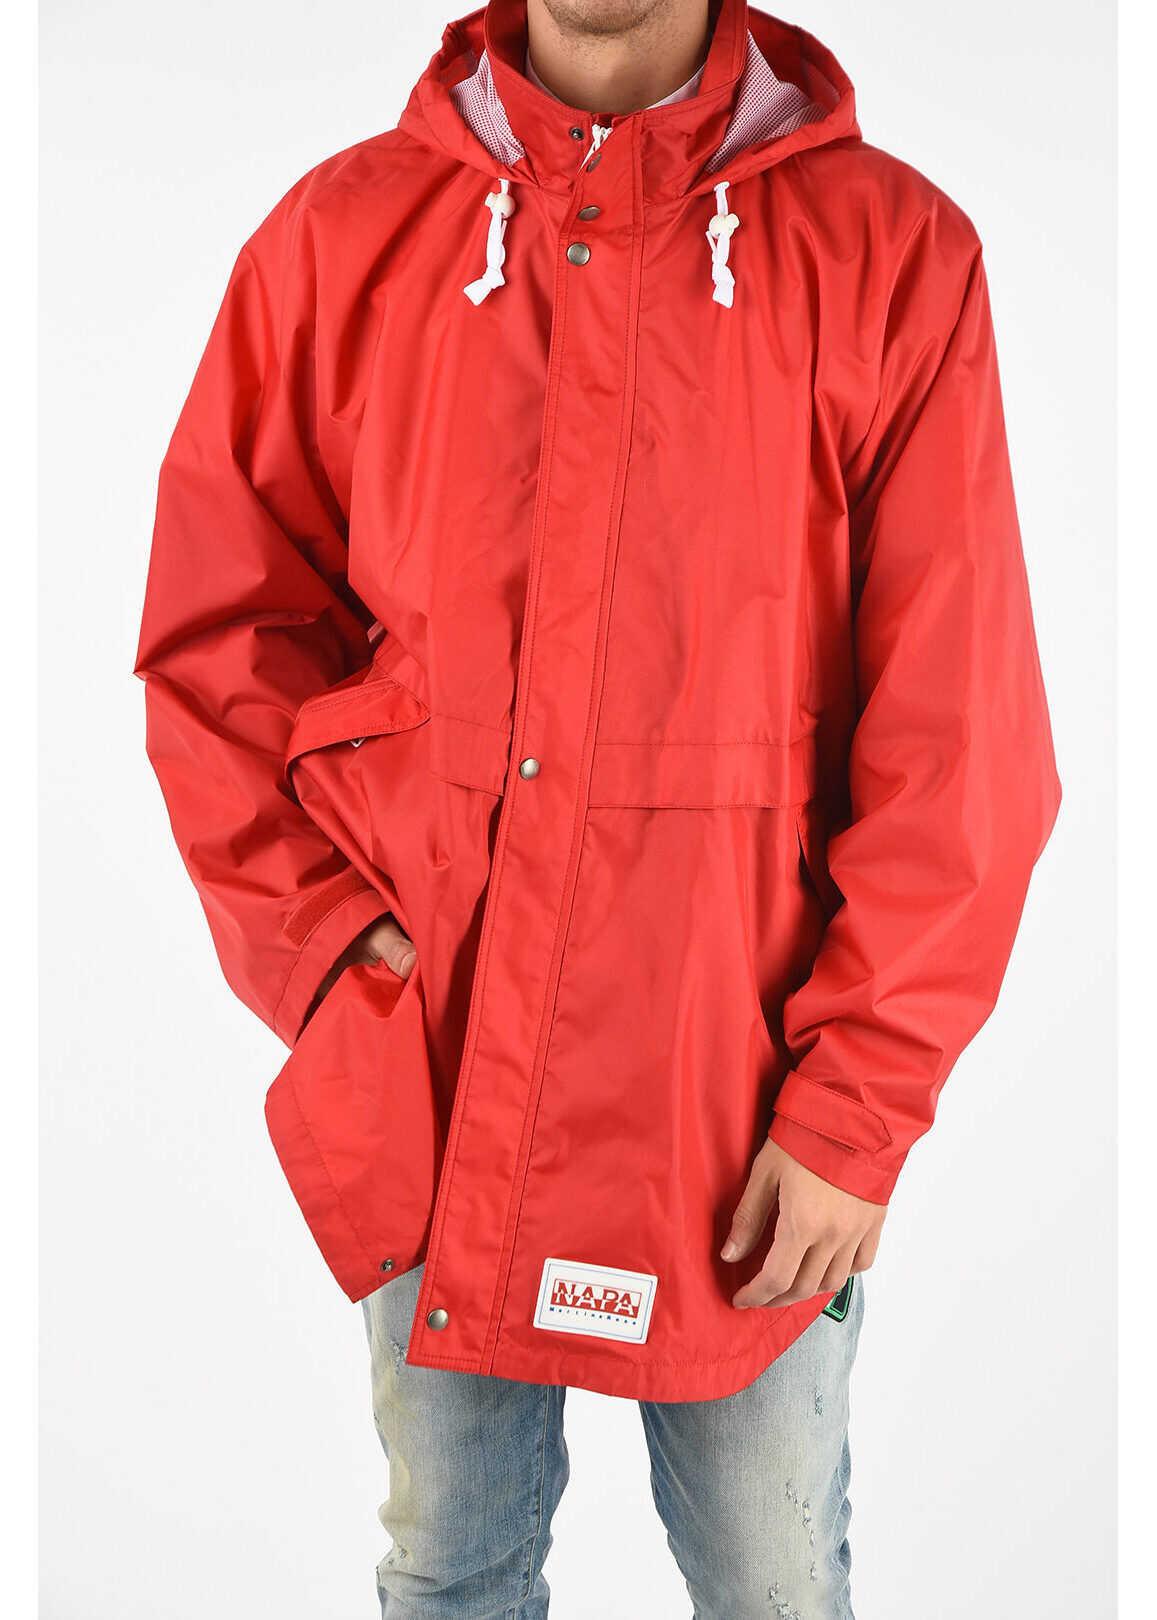 Napapijri MARTINE ROSE Waterproof RAINFOREST OP ALPHA Coat RED imagine